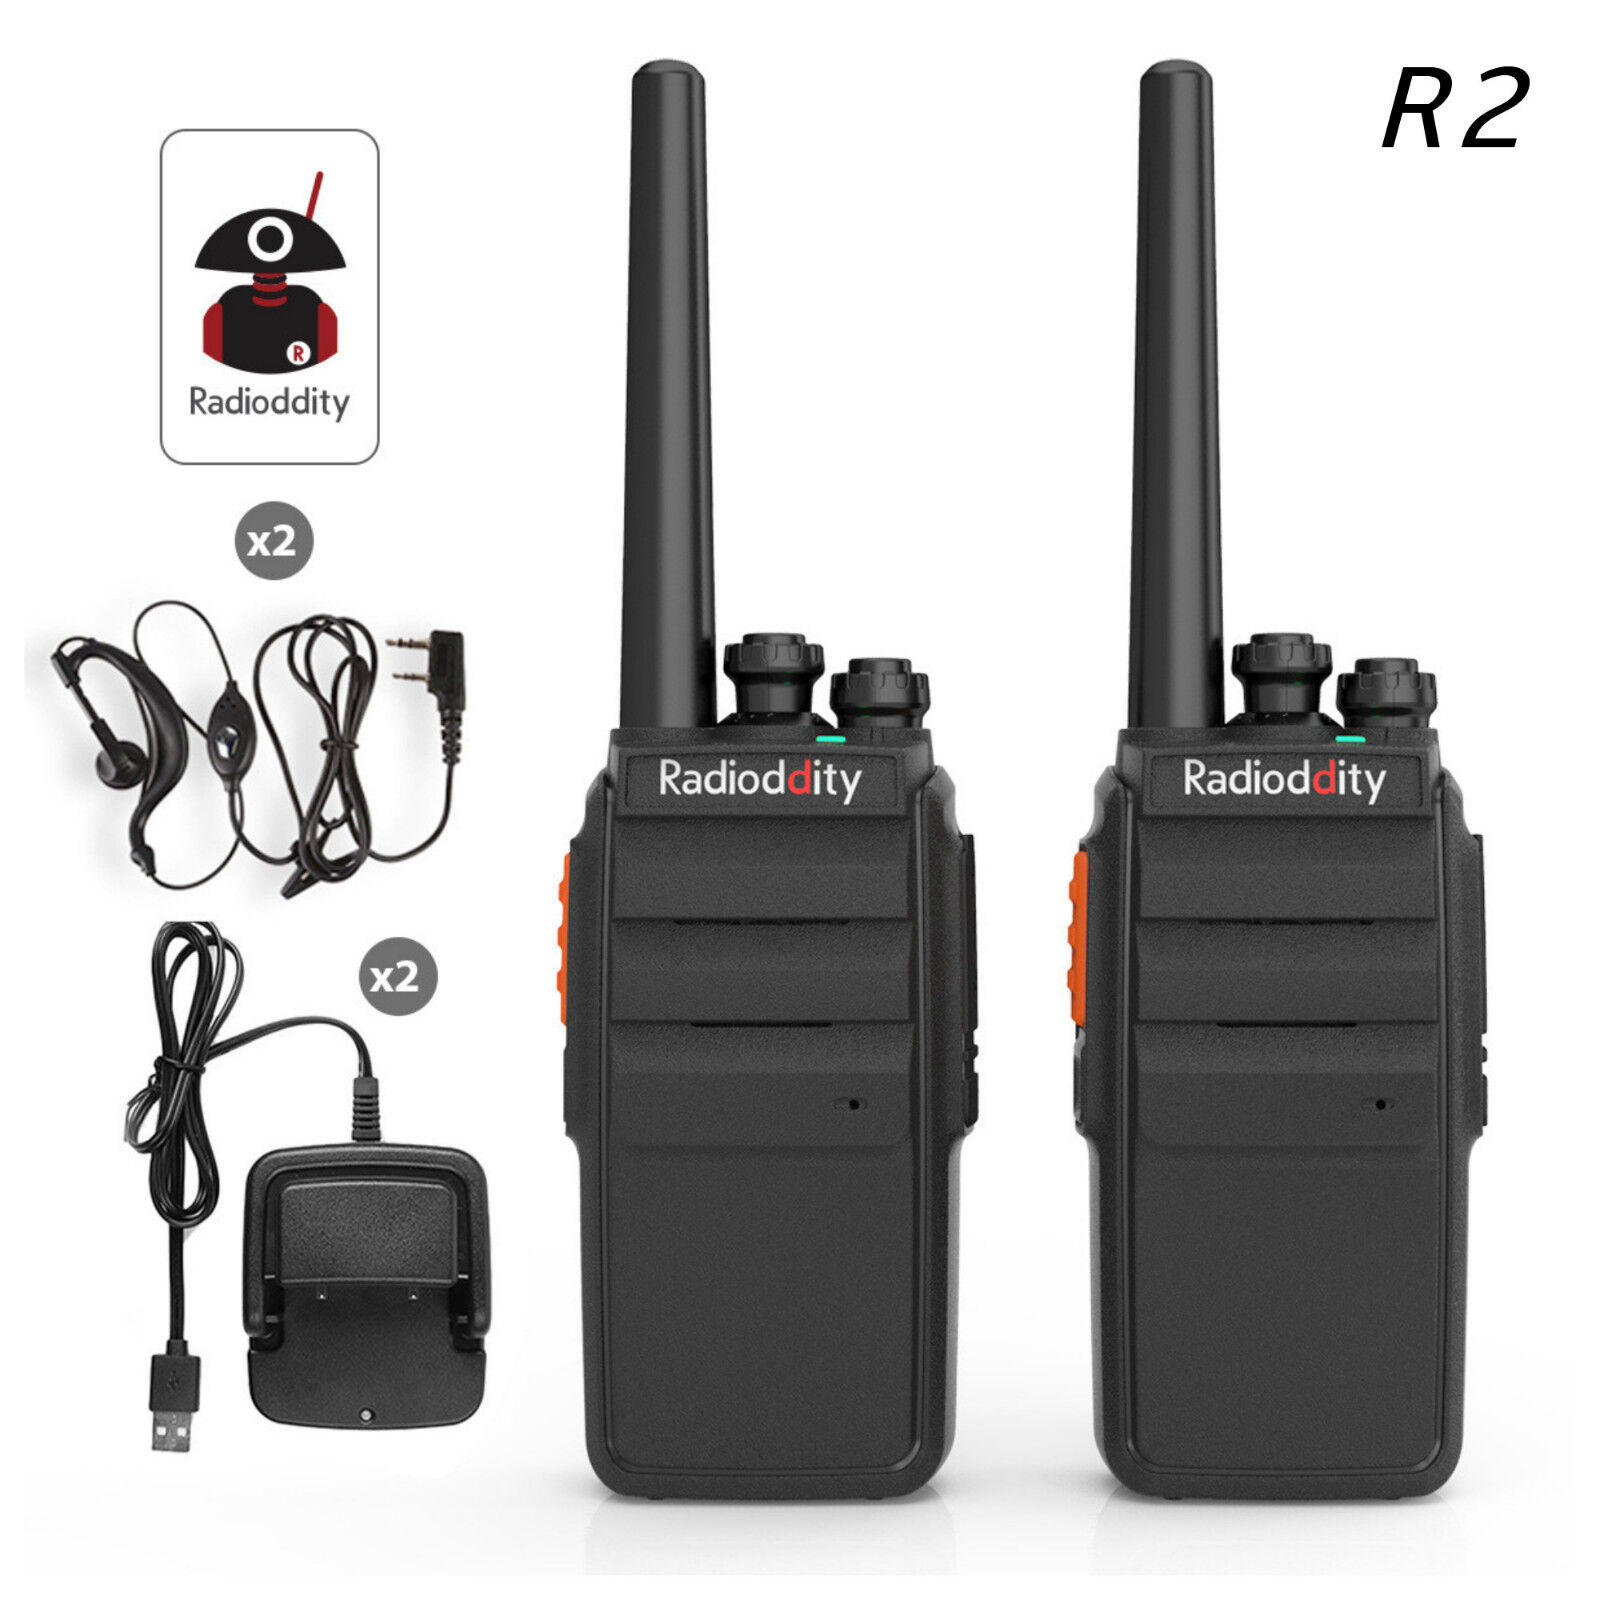 Details about 2x Radioddity R2 > Baofeng BF-888s UHF Scrambler Walkie  Talkie Two way Radio US